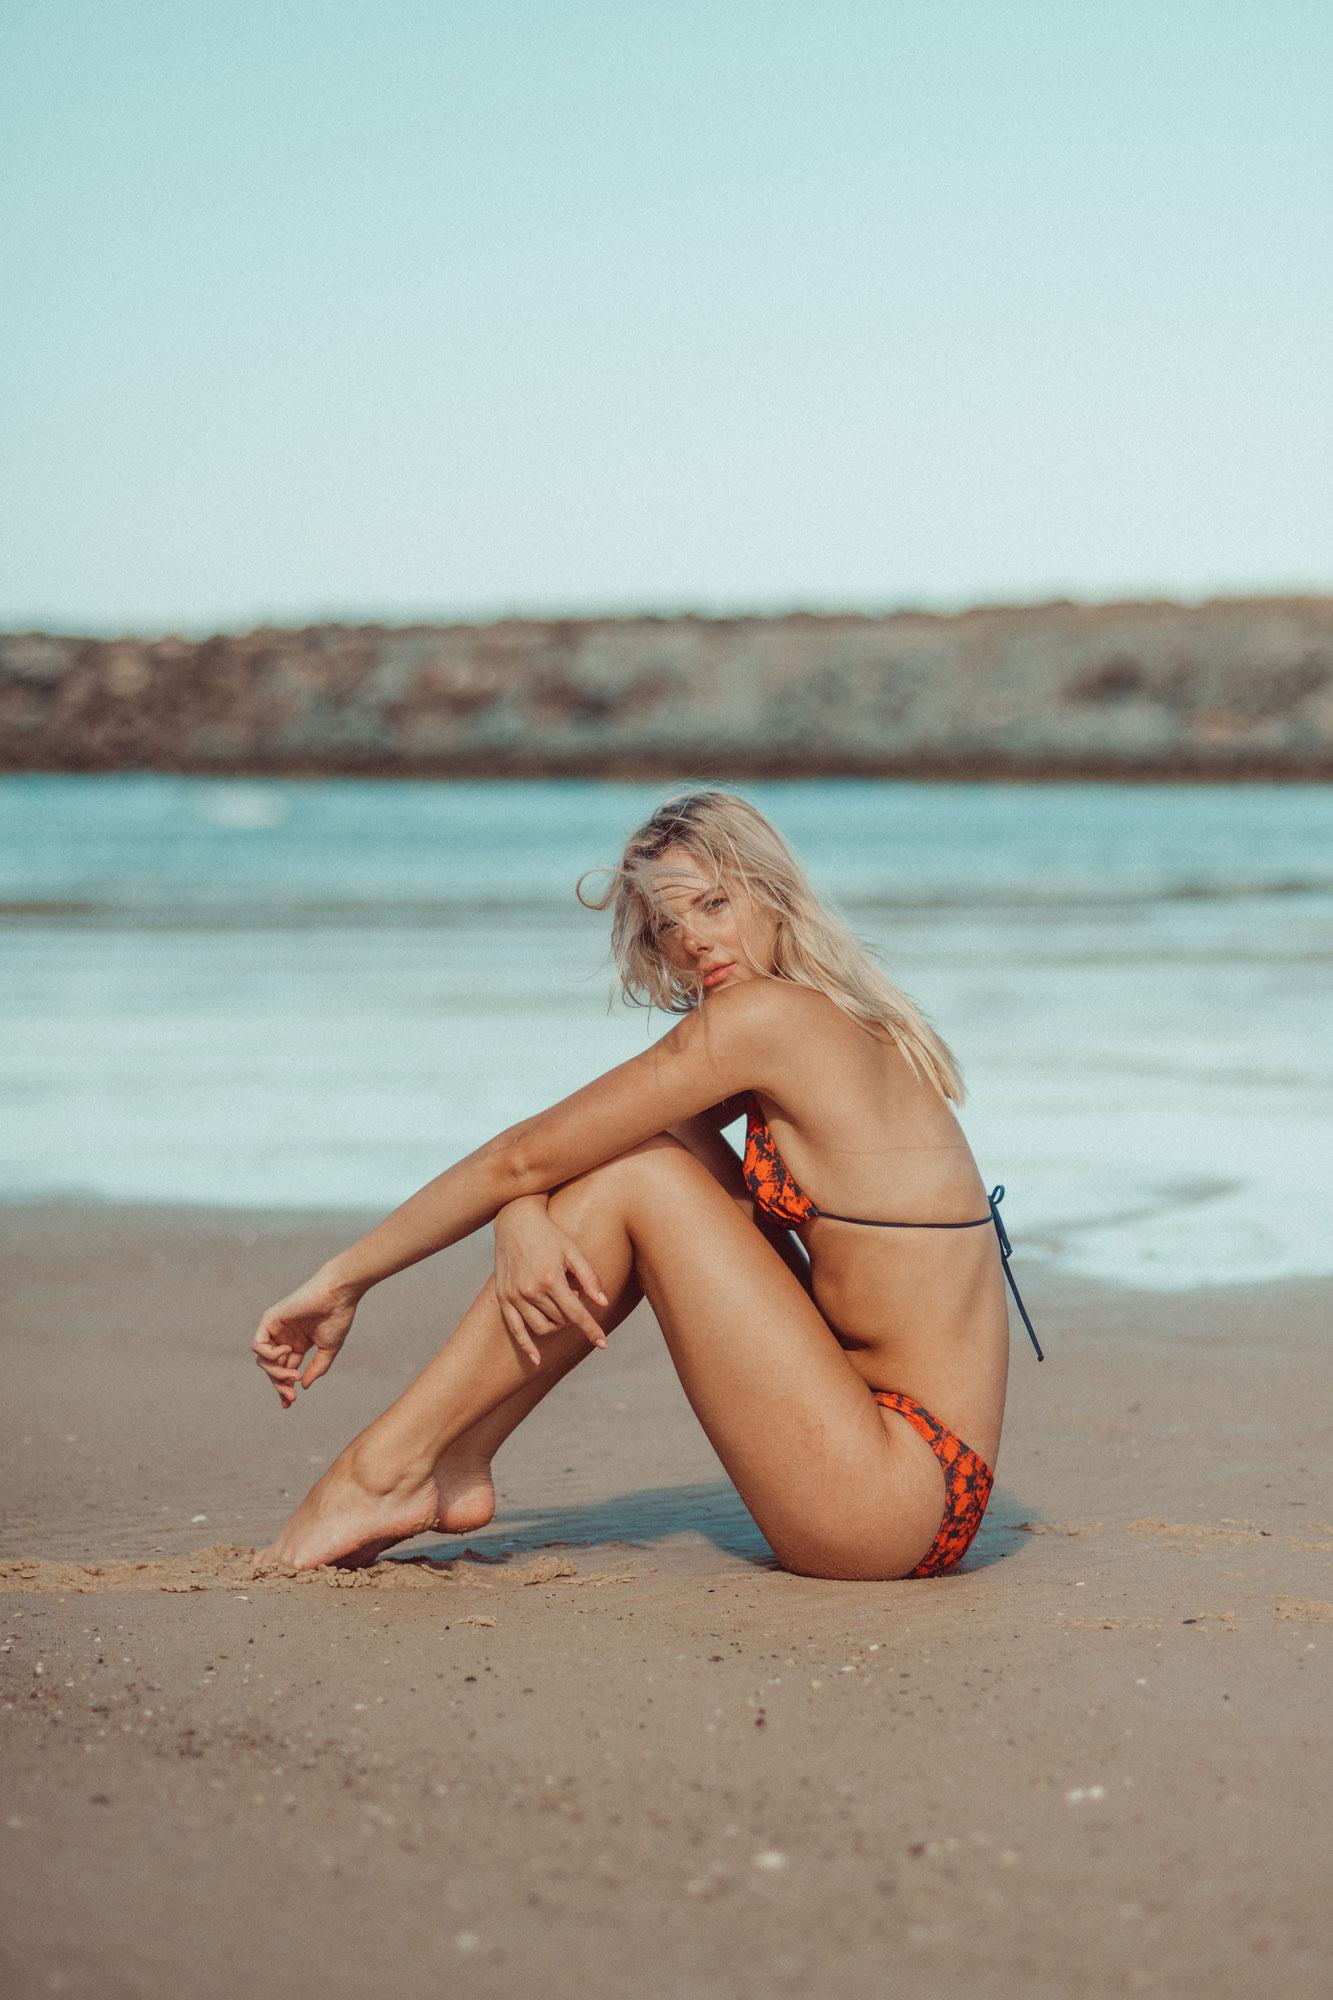 Ethical-Fashion-Poppy-Red-Triangle-Gold-Coast-Bikini-Swimwear-Lily-Goodare-Gold-Coast-Model-by-Photographer-Kim-Akrigg-in-Liar-the-Label.jpg